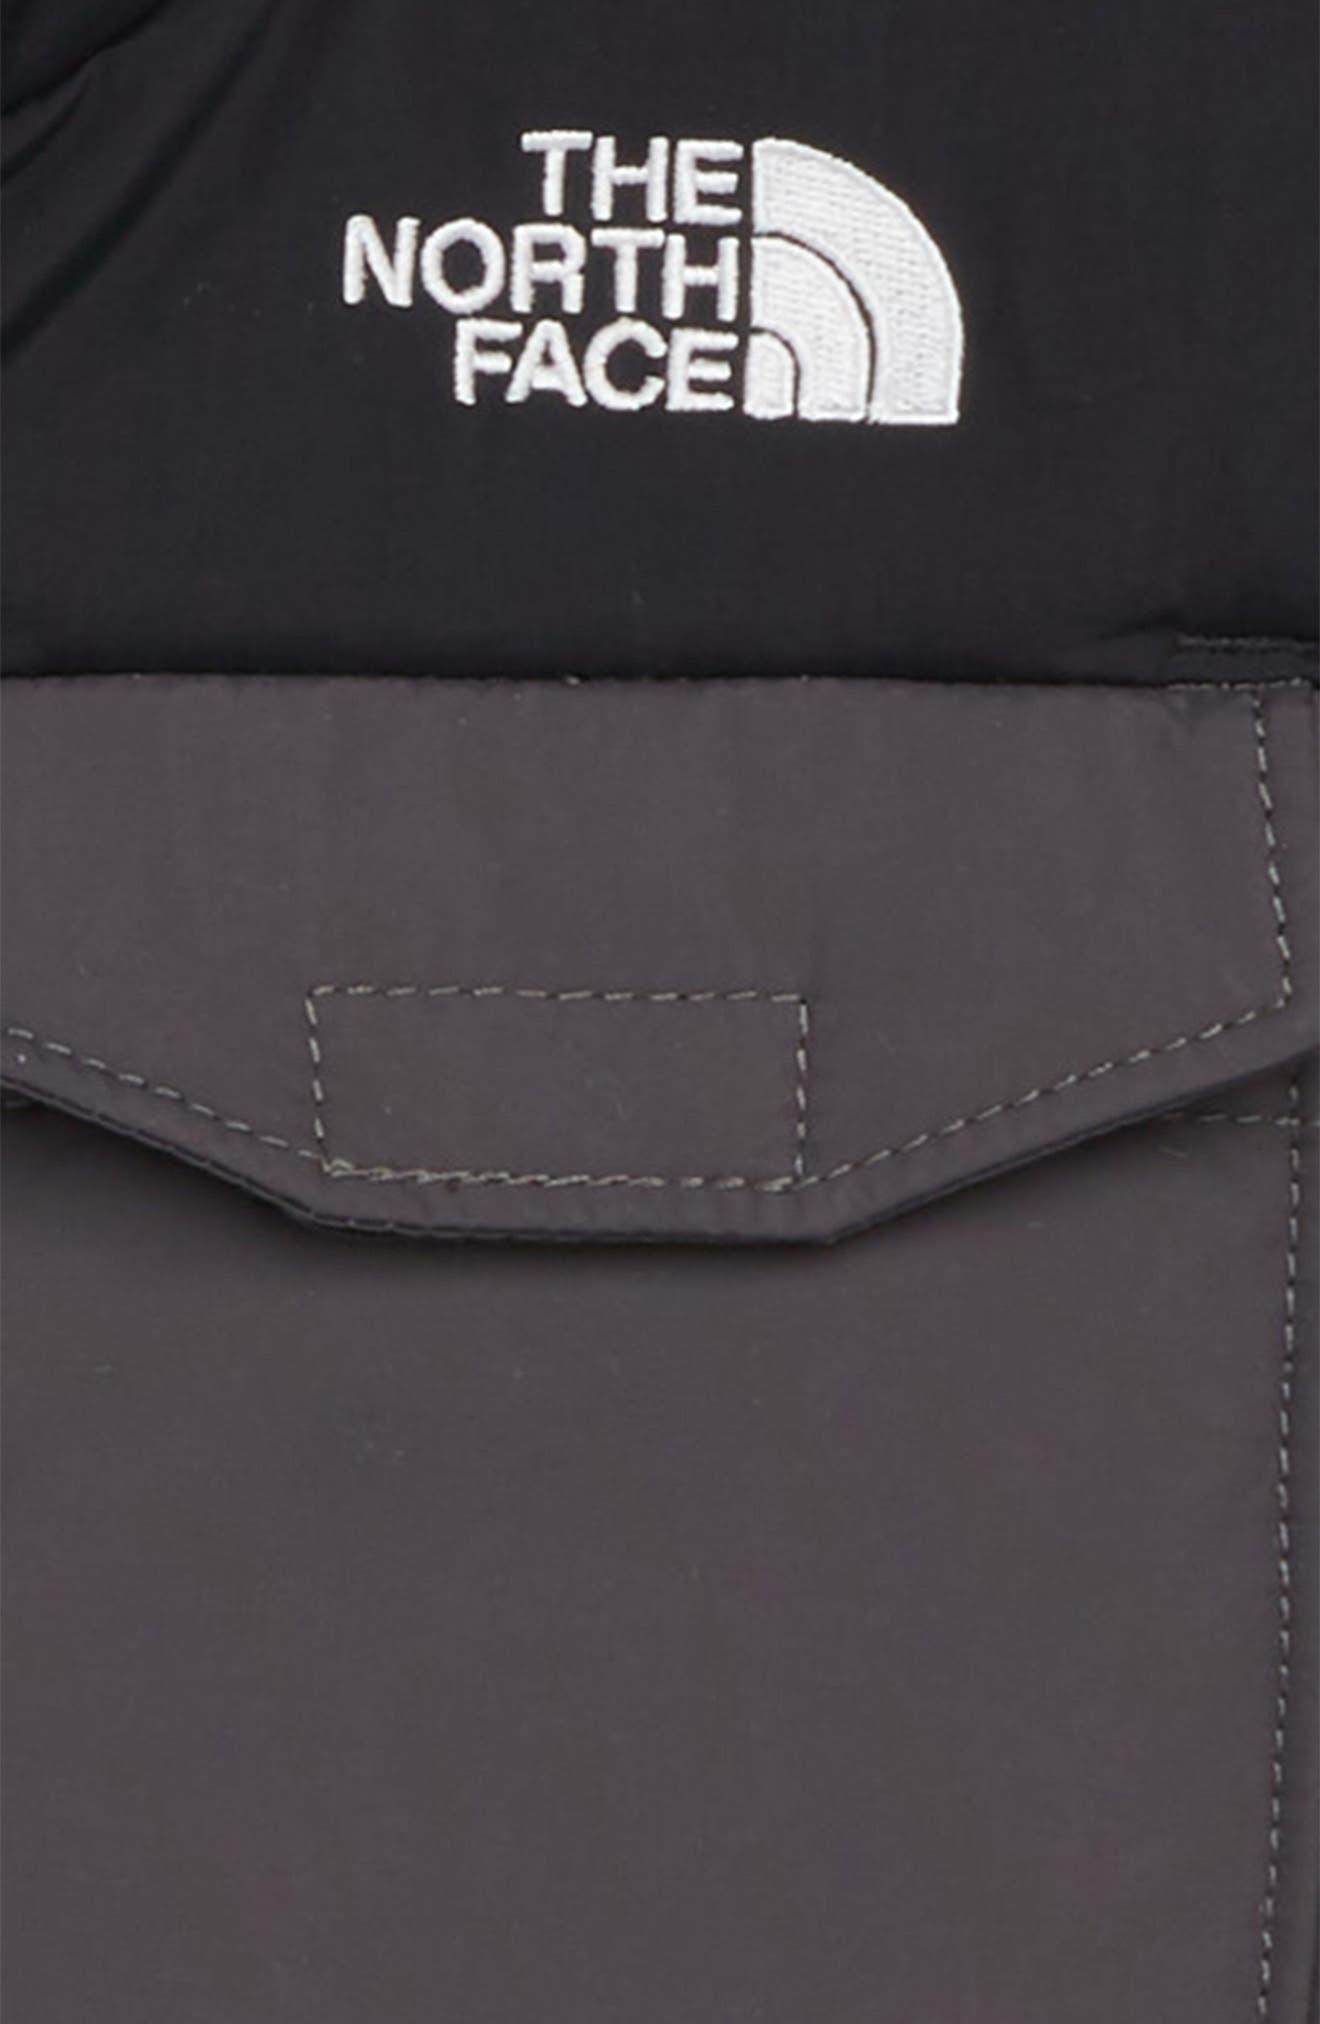 Patrick's Point Vest,                             Alternate thumbnail 2, color,                             GRAPHITE GREY/ TNF BLACK